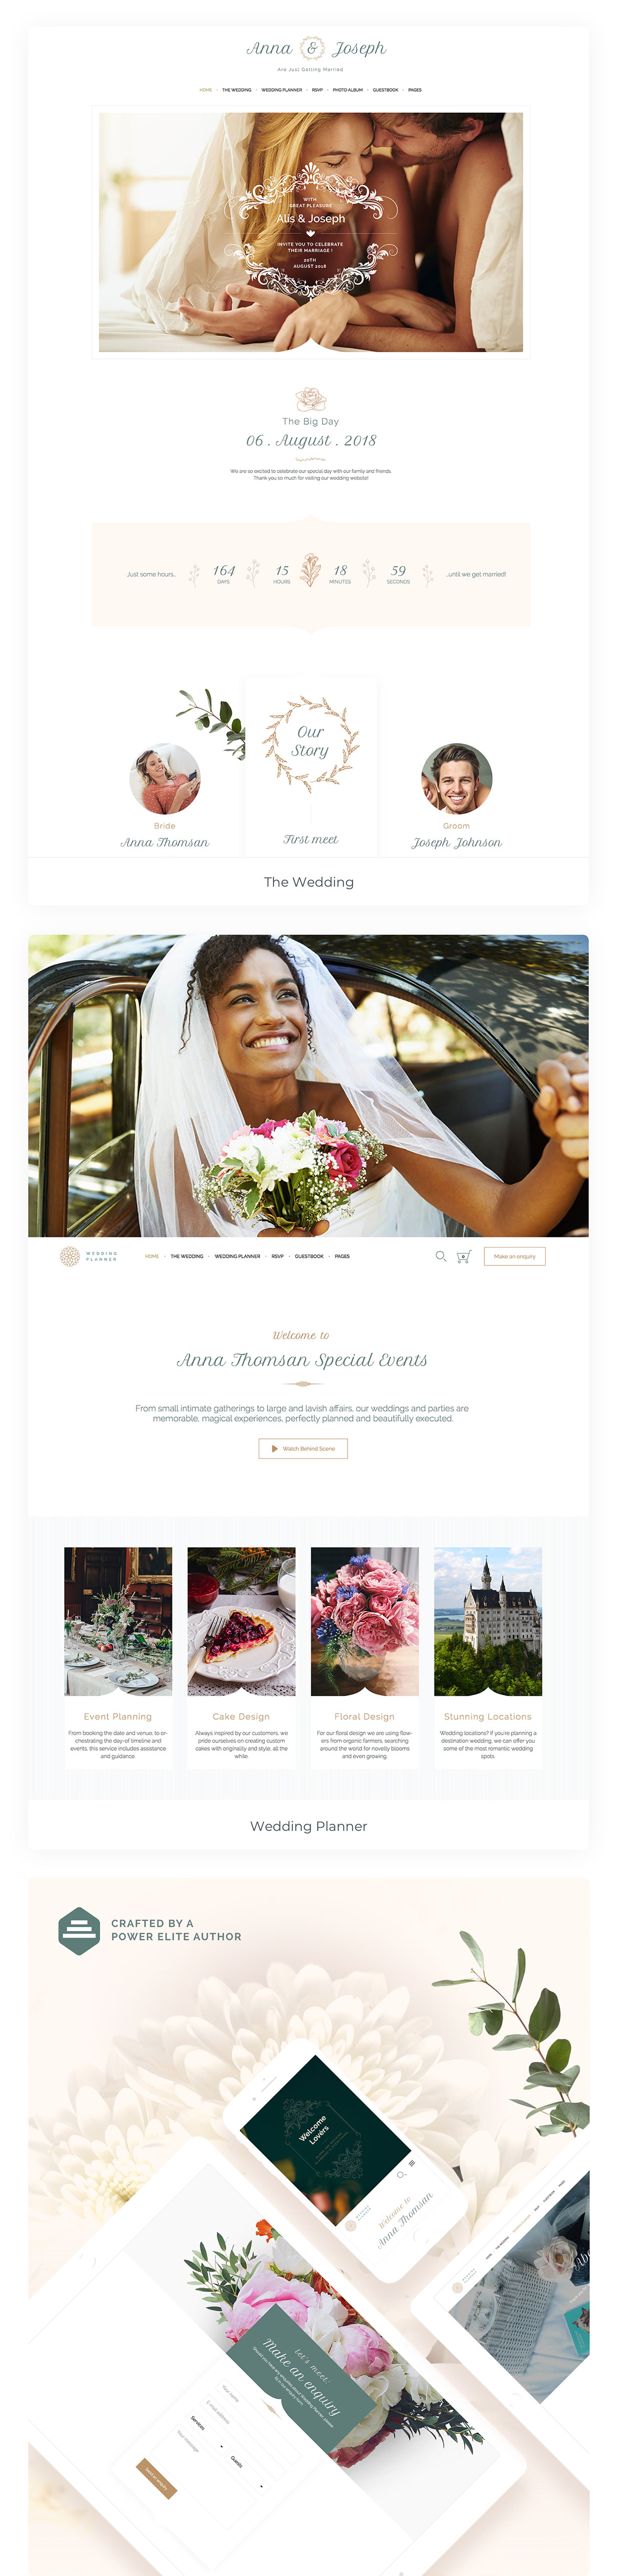 Ali S Wedding.Alis Wedding Planner By Vamtam Themeforest